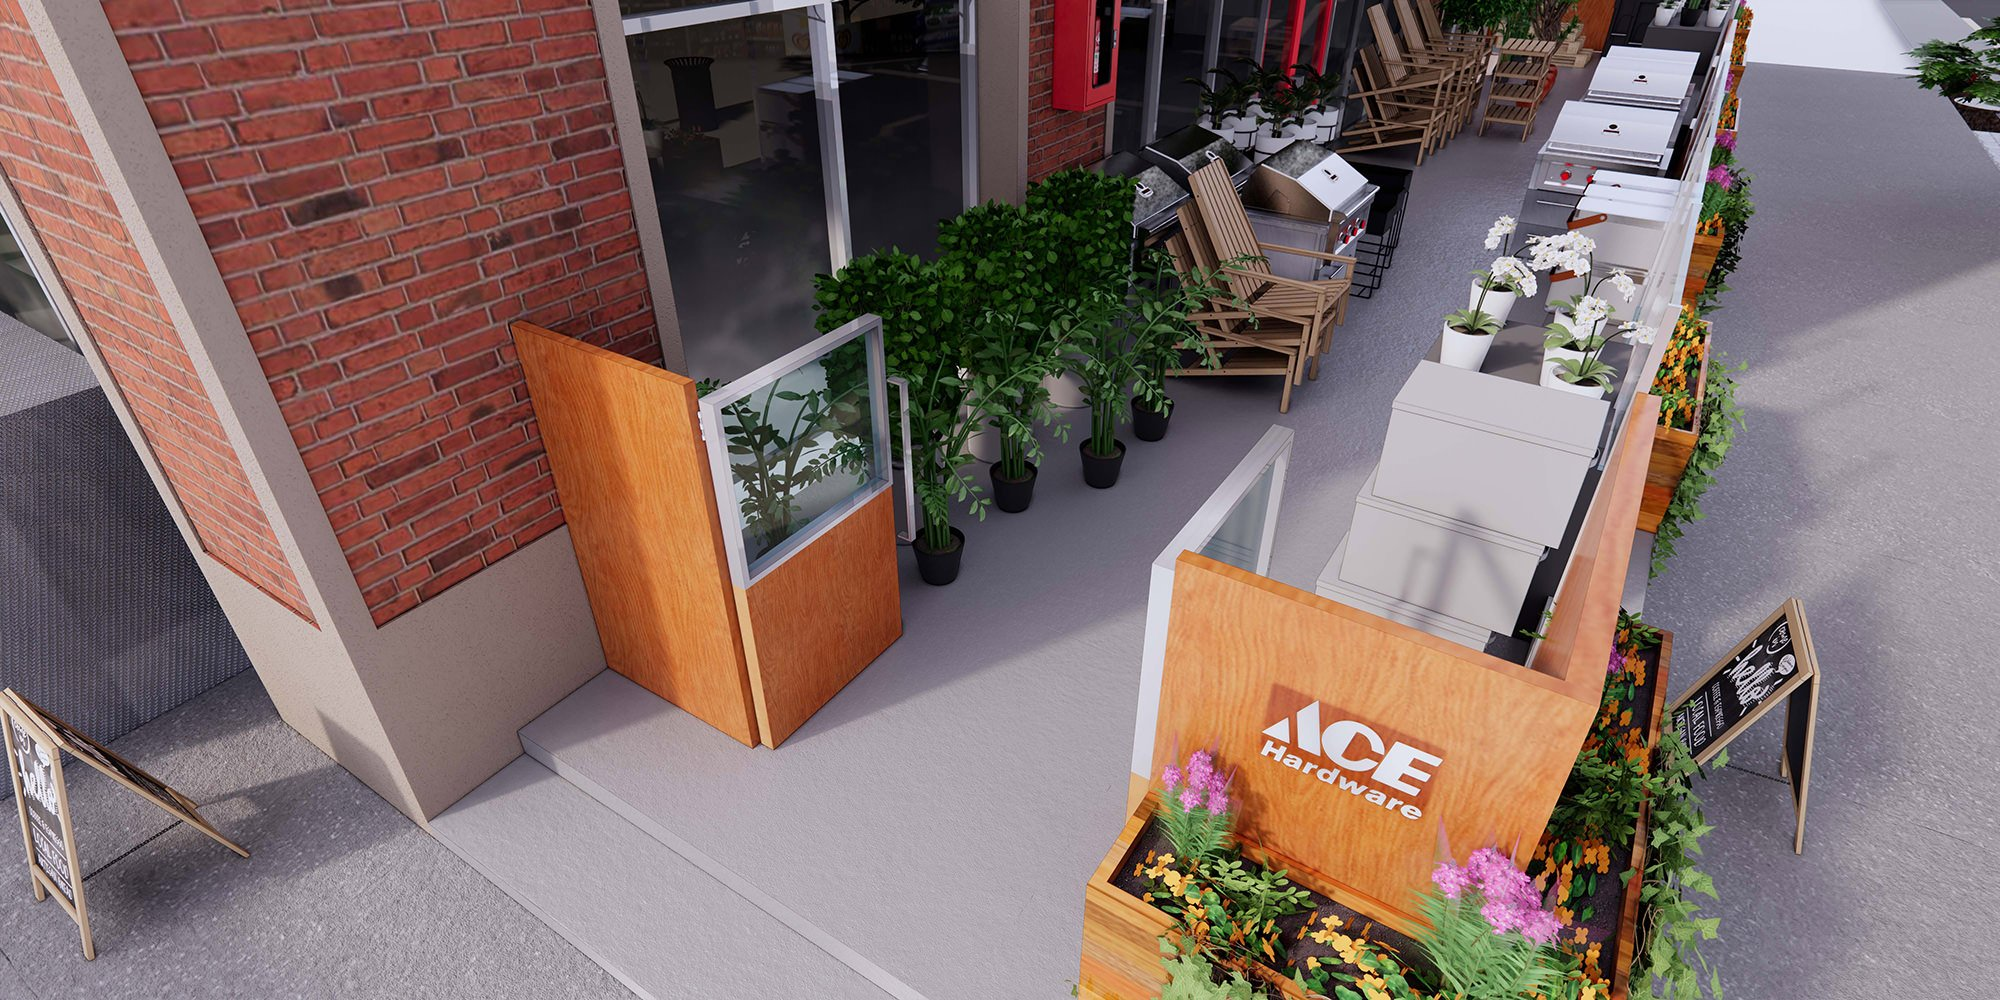 ACE Hardware Sheps Midtown street rendering